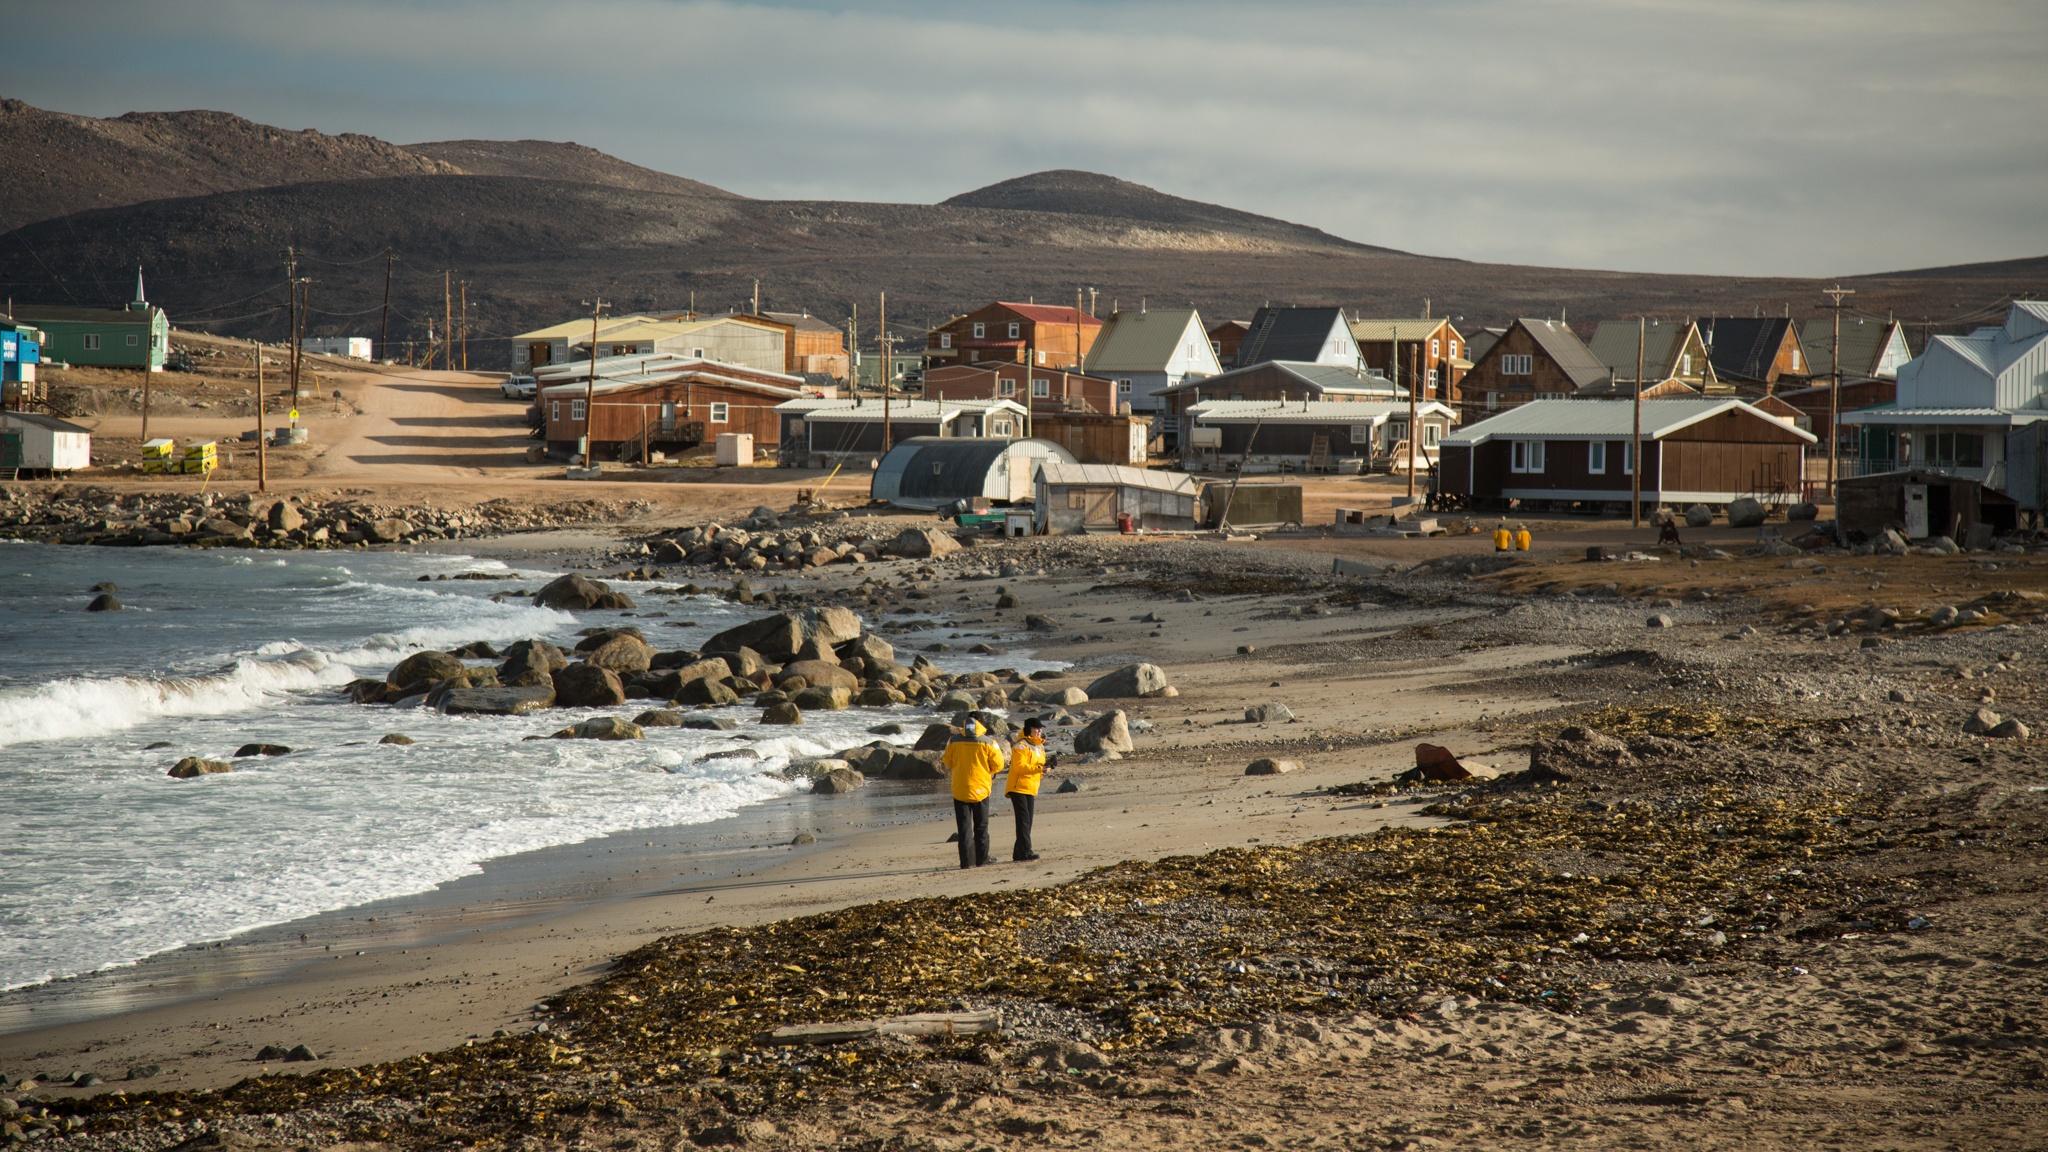 Qikiqtarjuaq_Baffin Island_acaciajohnson.jpg